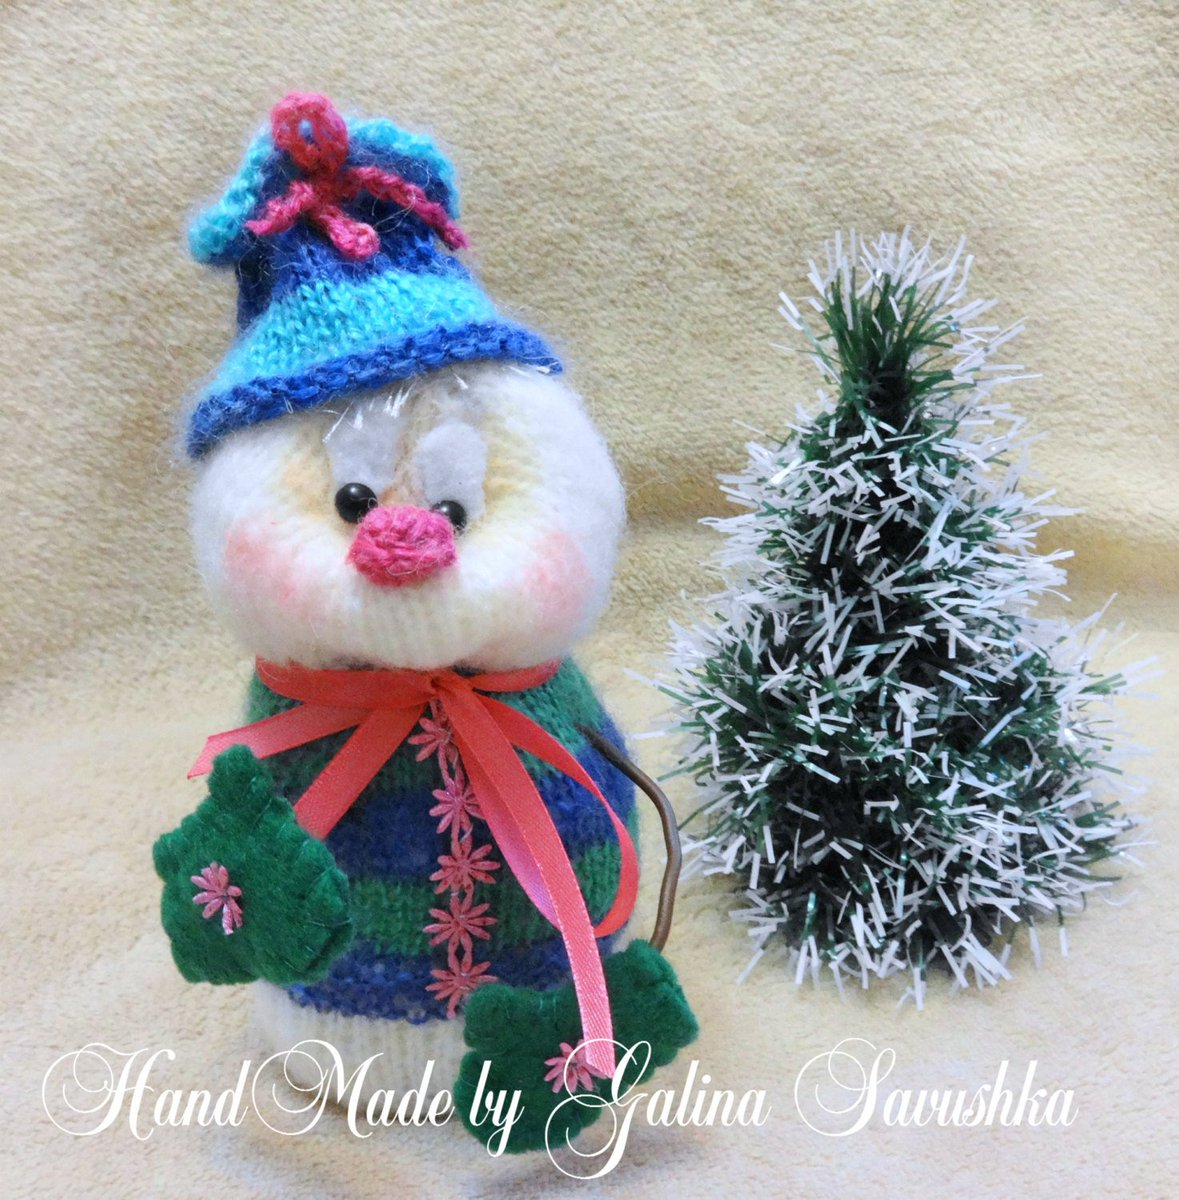 Amigurumi Snowman Crochet Free Patterns - Crochet & Knitting | 1200x1179